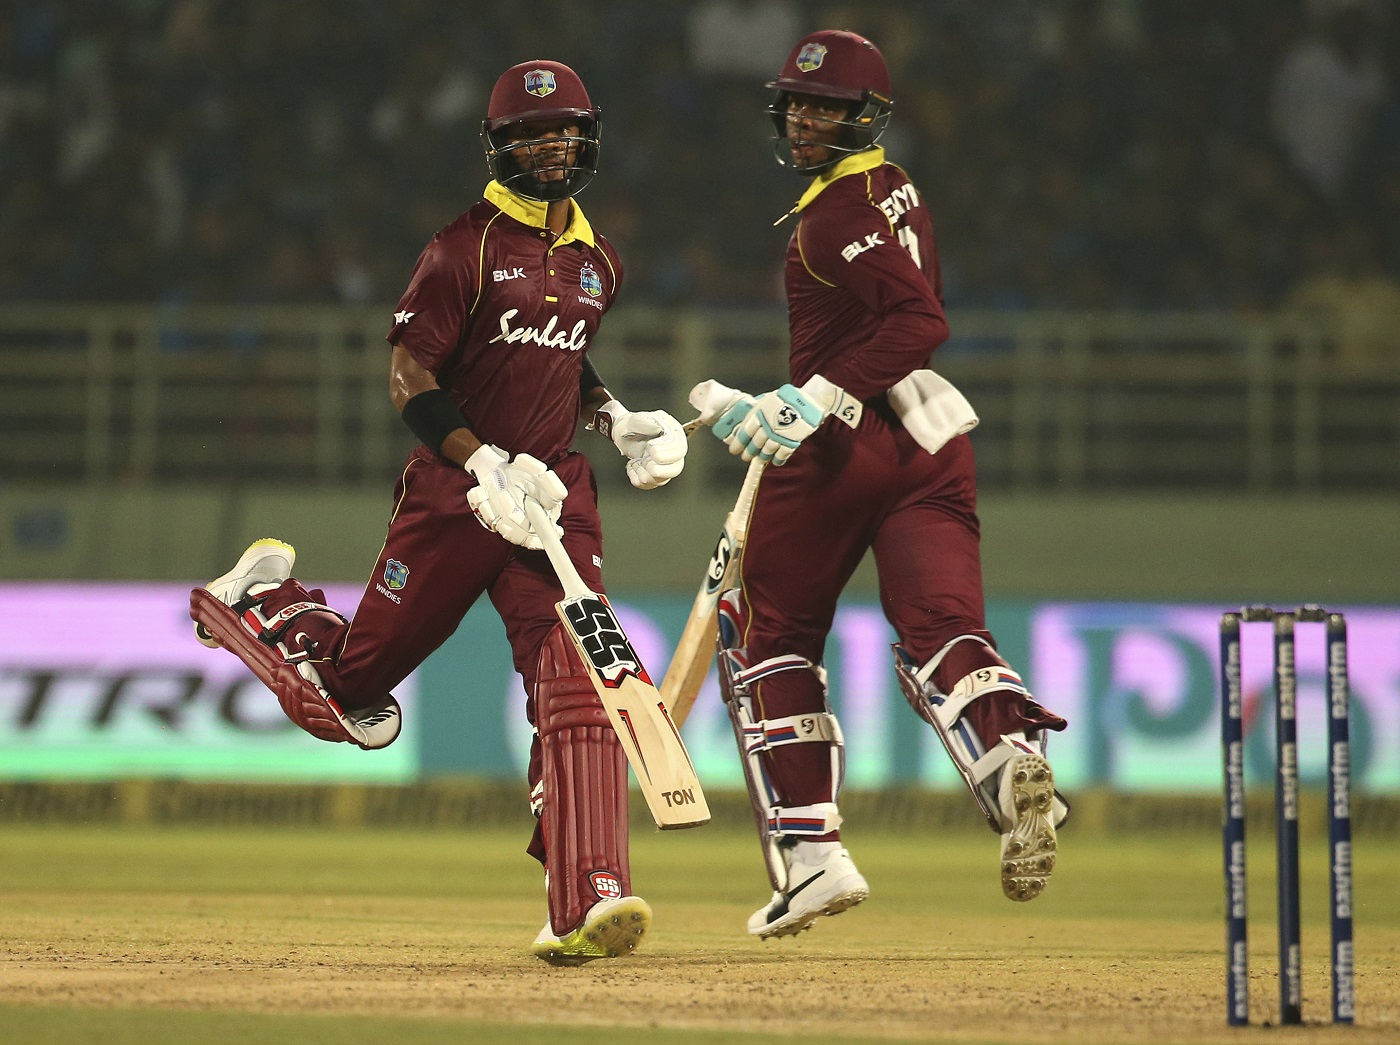 Full Scorecard Of India Vs West Indies 3rd T20i 2018 Score